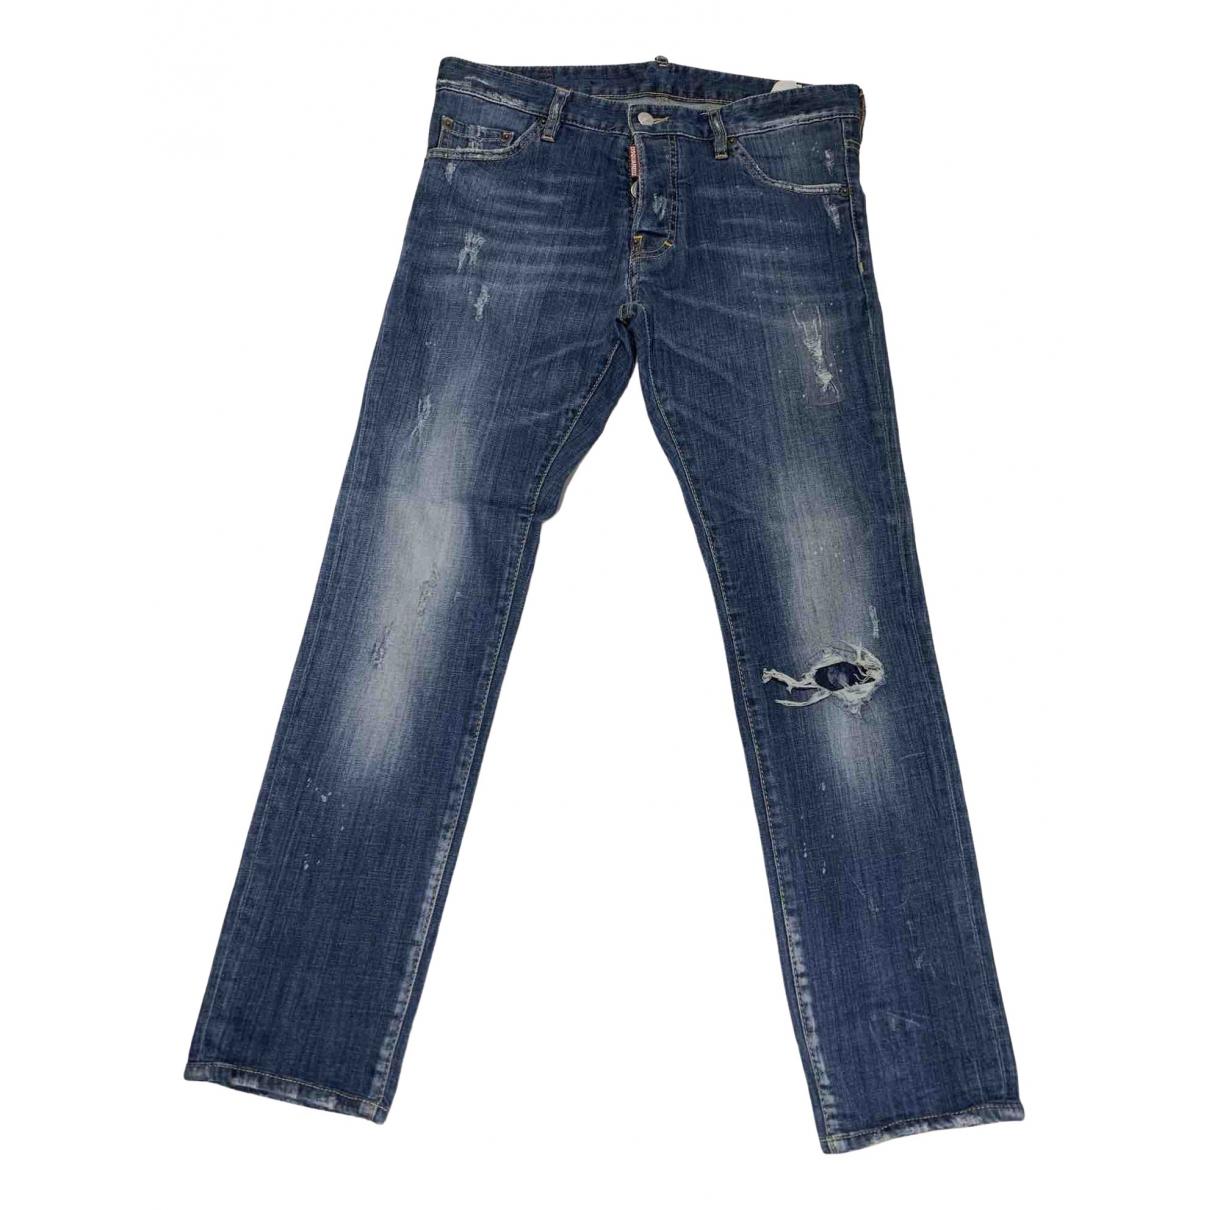 Dsquared2 \N Blue Cotton - elasthane Jeans for Men 31 US